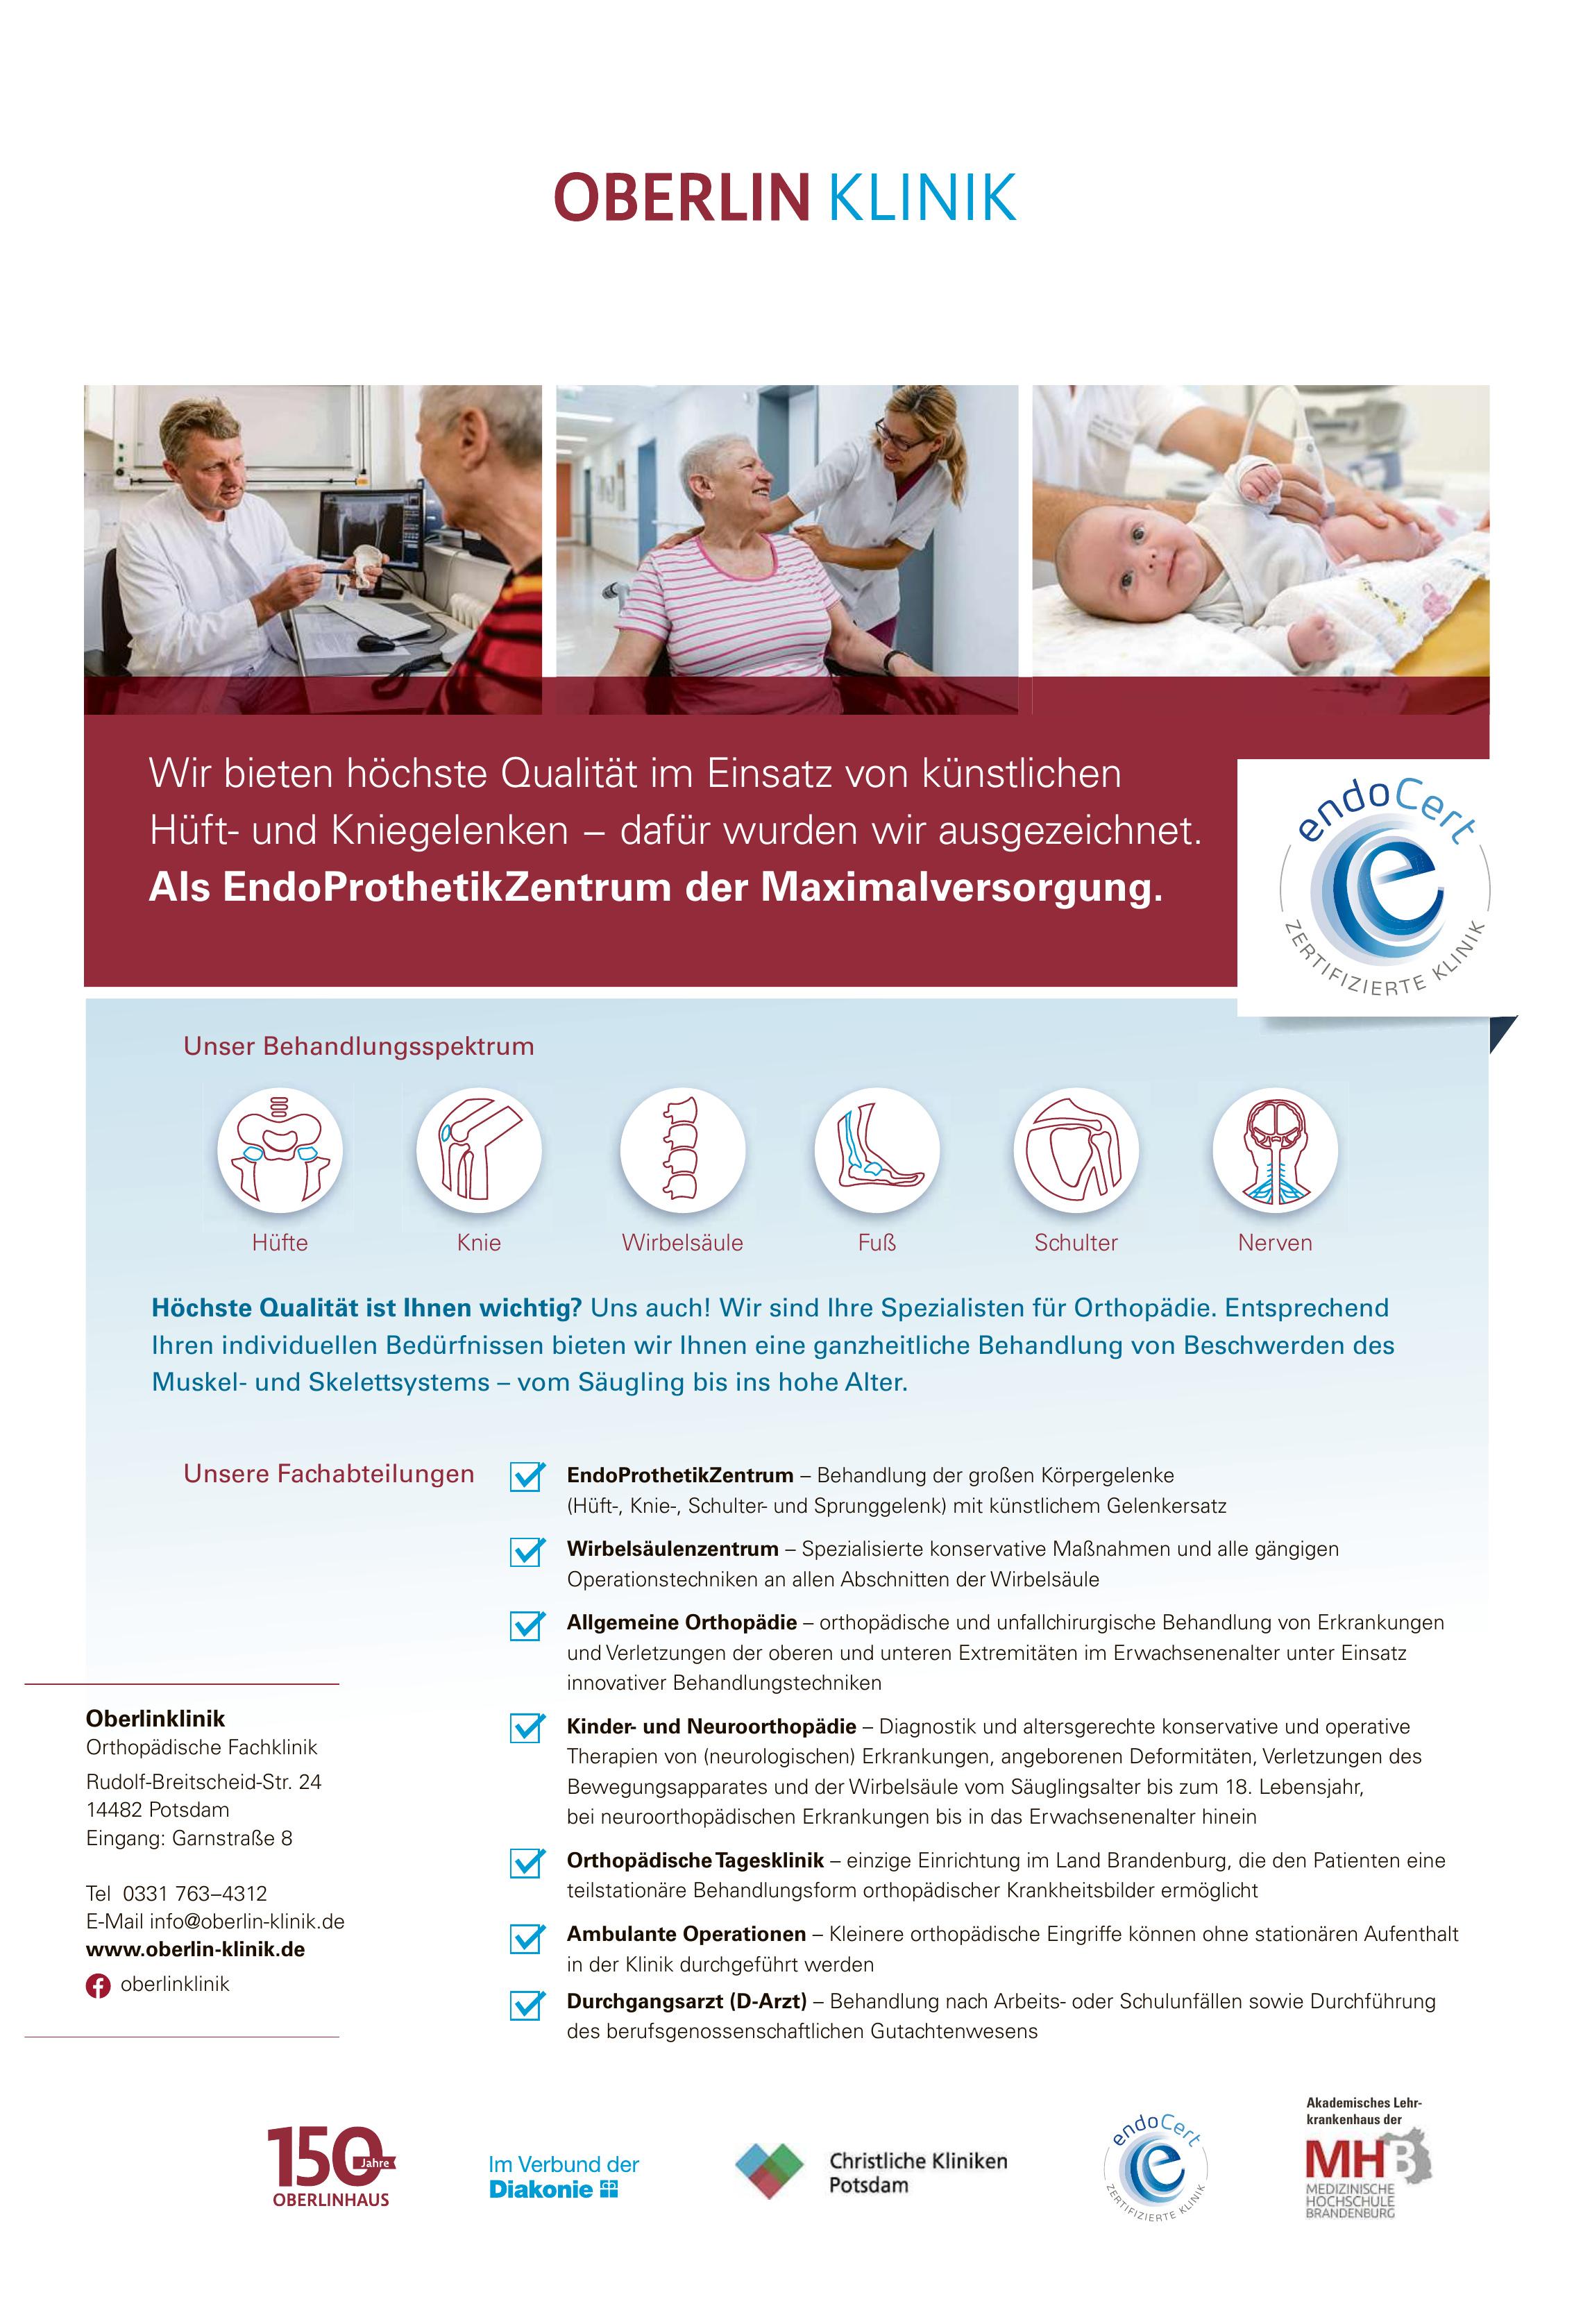 Oberlinklinik Orthopädische Fachklinik